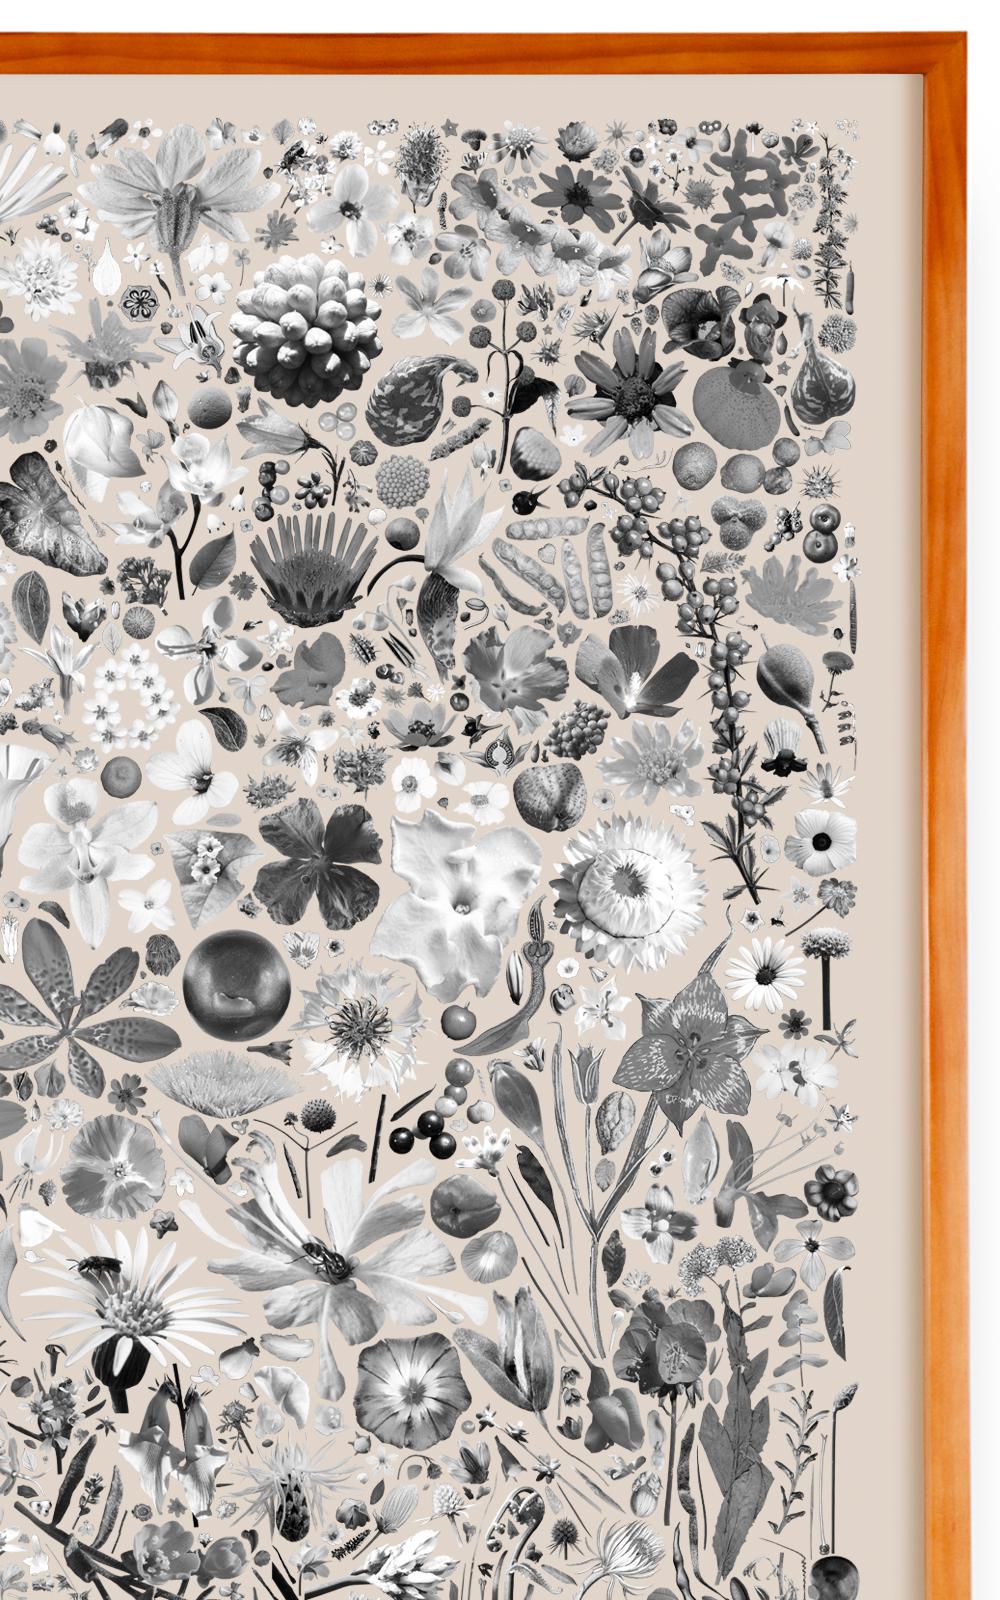 Case Simmons, Simmons & Burke, Plant Collection Palette #2, Digital Collage,Digital Art, Photoshop Collage, Contemporary Collage,Case Simmons Art, Collage Fine Art, Plant Art, Digital Flower Art, Collection Art, Archive Art, Kohn Gallery